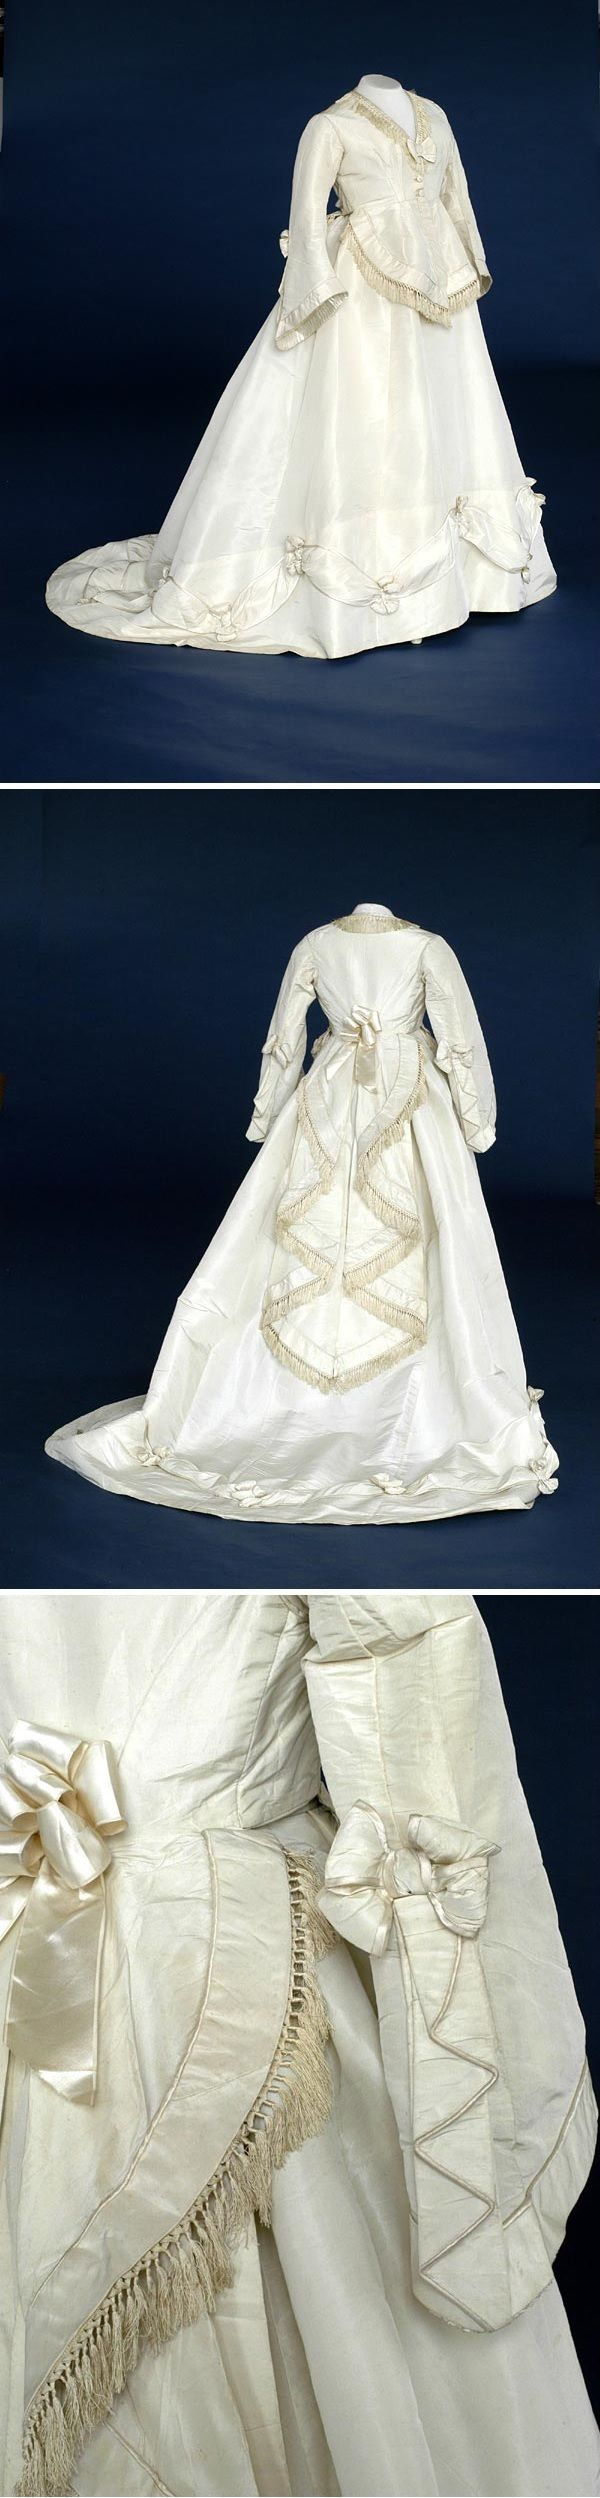 wedding gowns s wedding dress Wedding Dress England Two piece cream silk wedding dress trimmed with